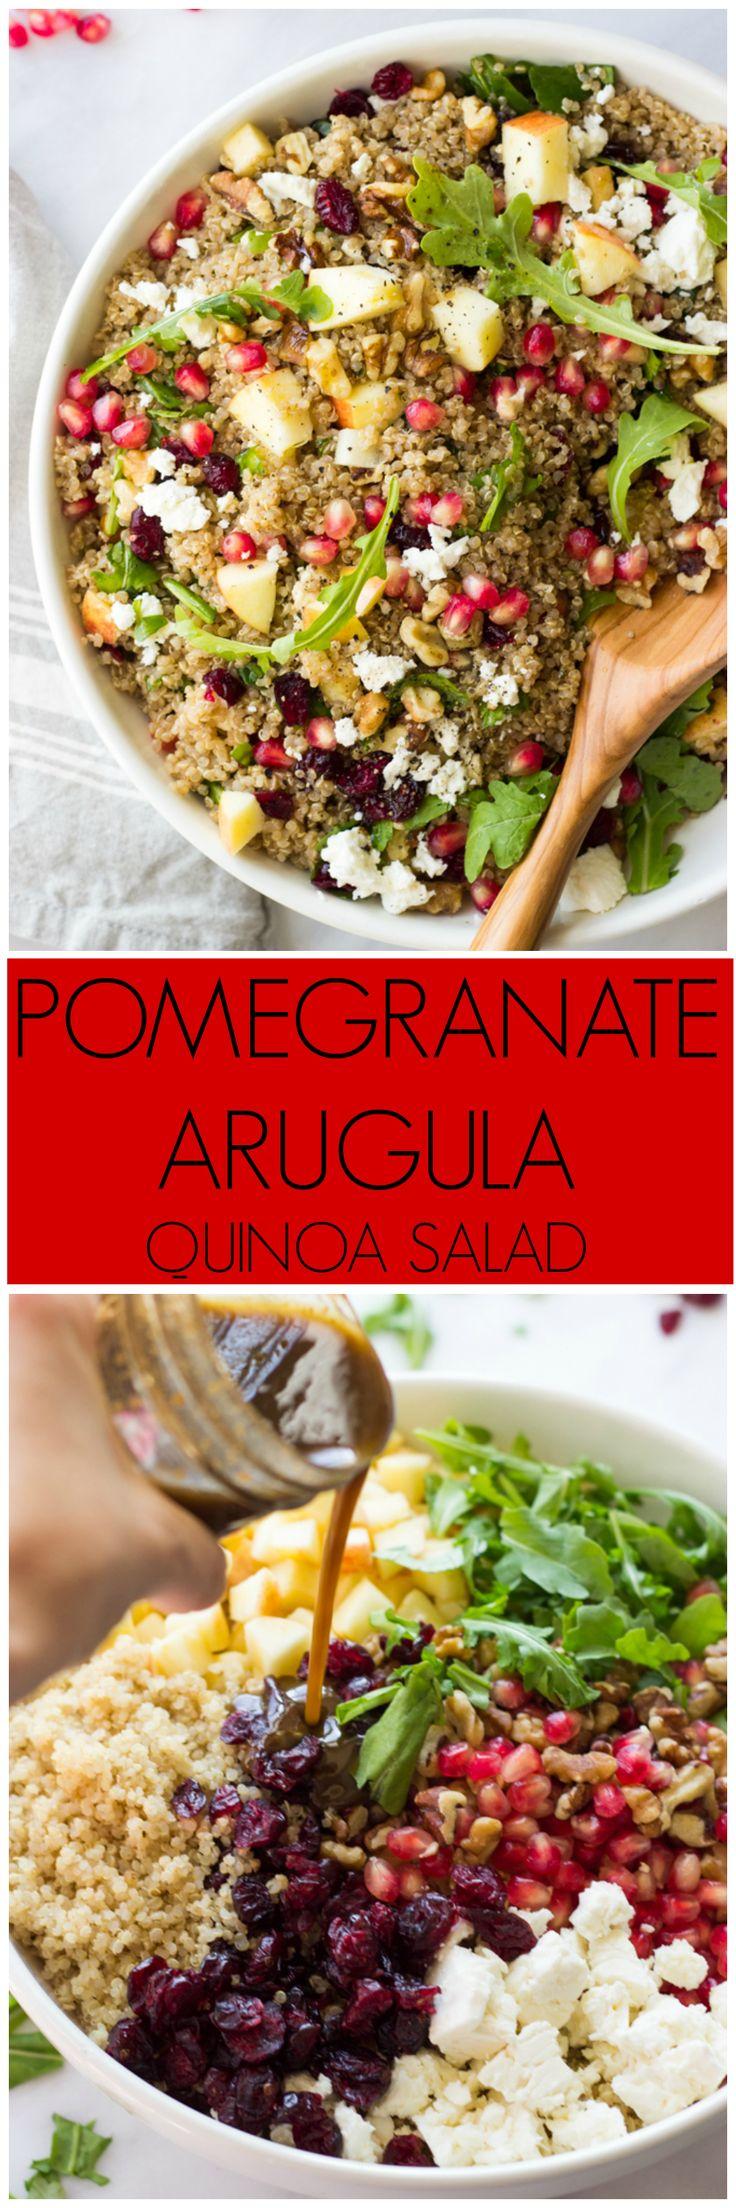 Pomegranate Arugula Quinoa Salad - most festive and delicious salad you will ever make! | littlebroken.com @littlebroken